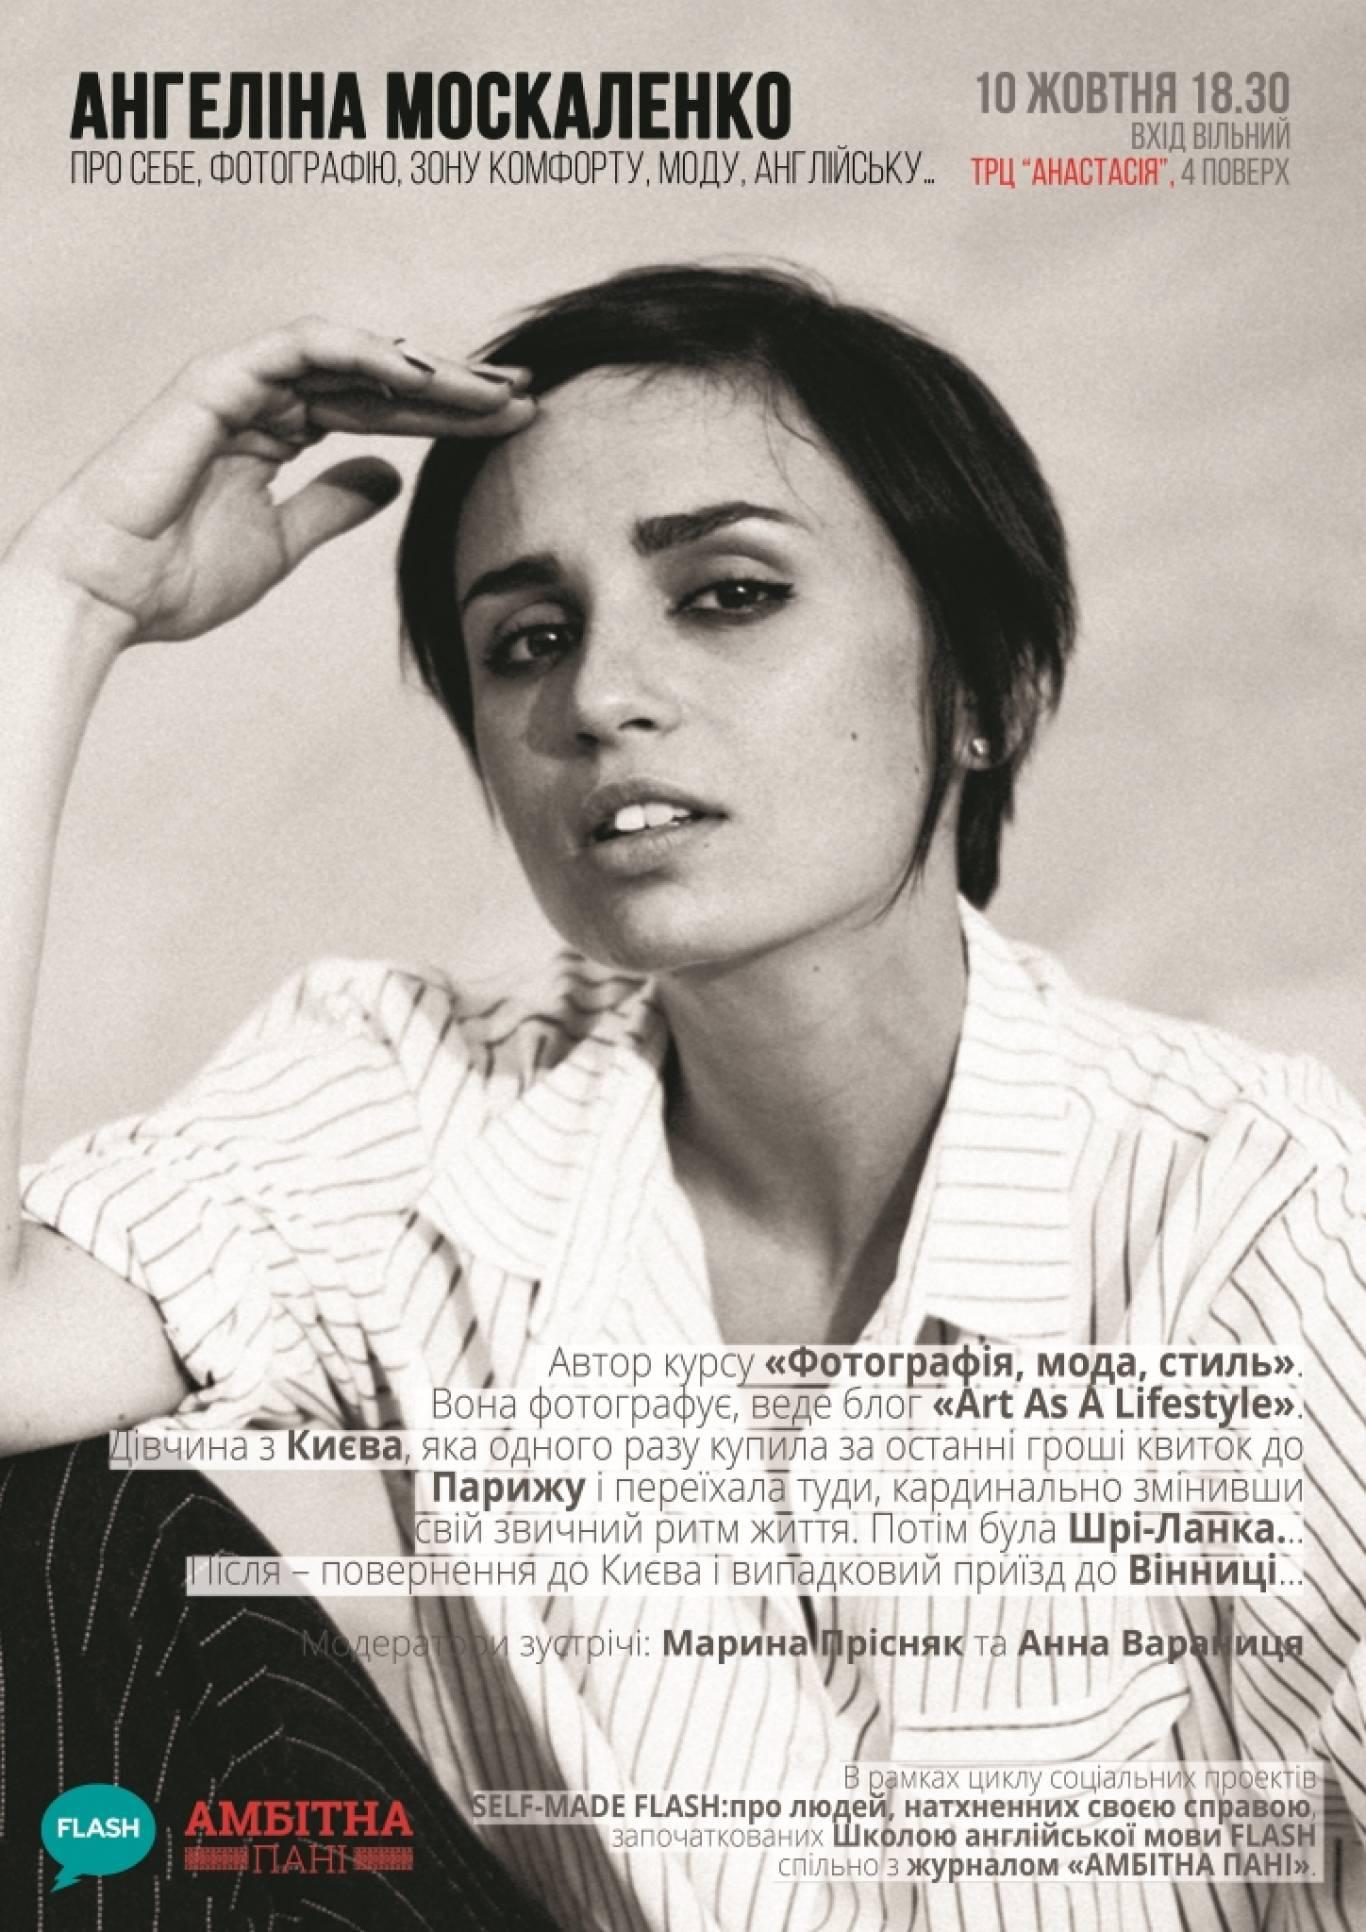 SELF-MADE FLASH з Ангеліною Москаленко